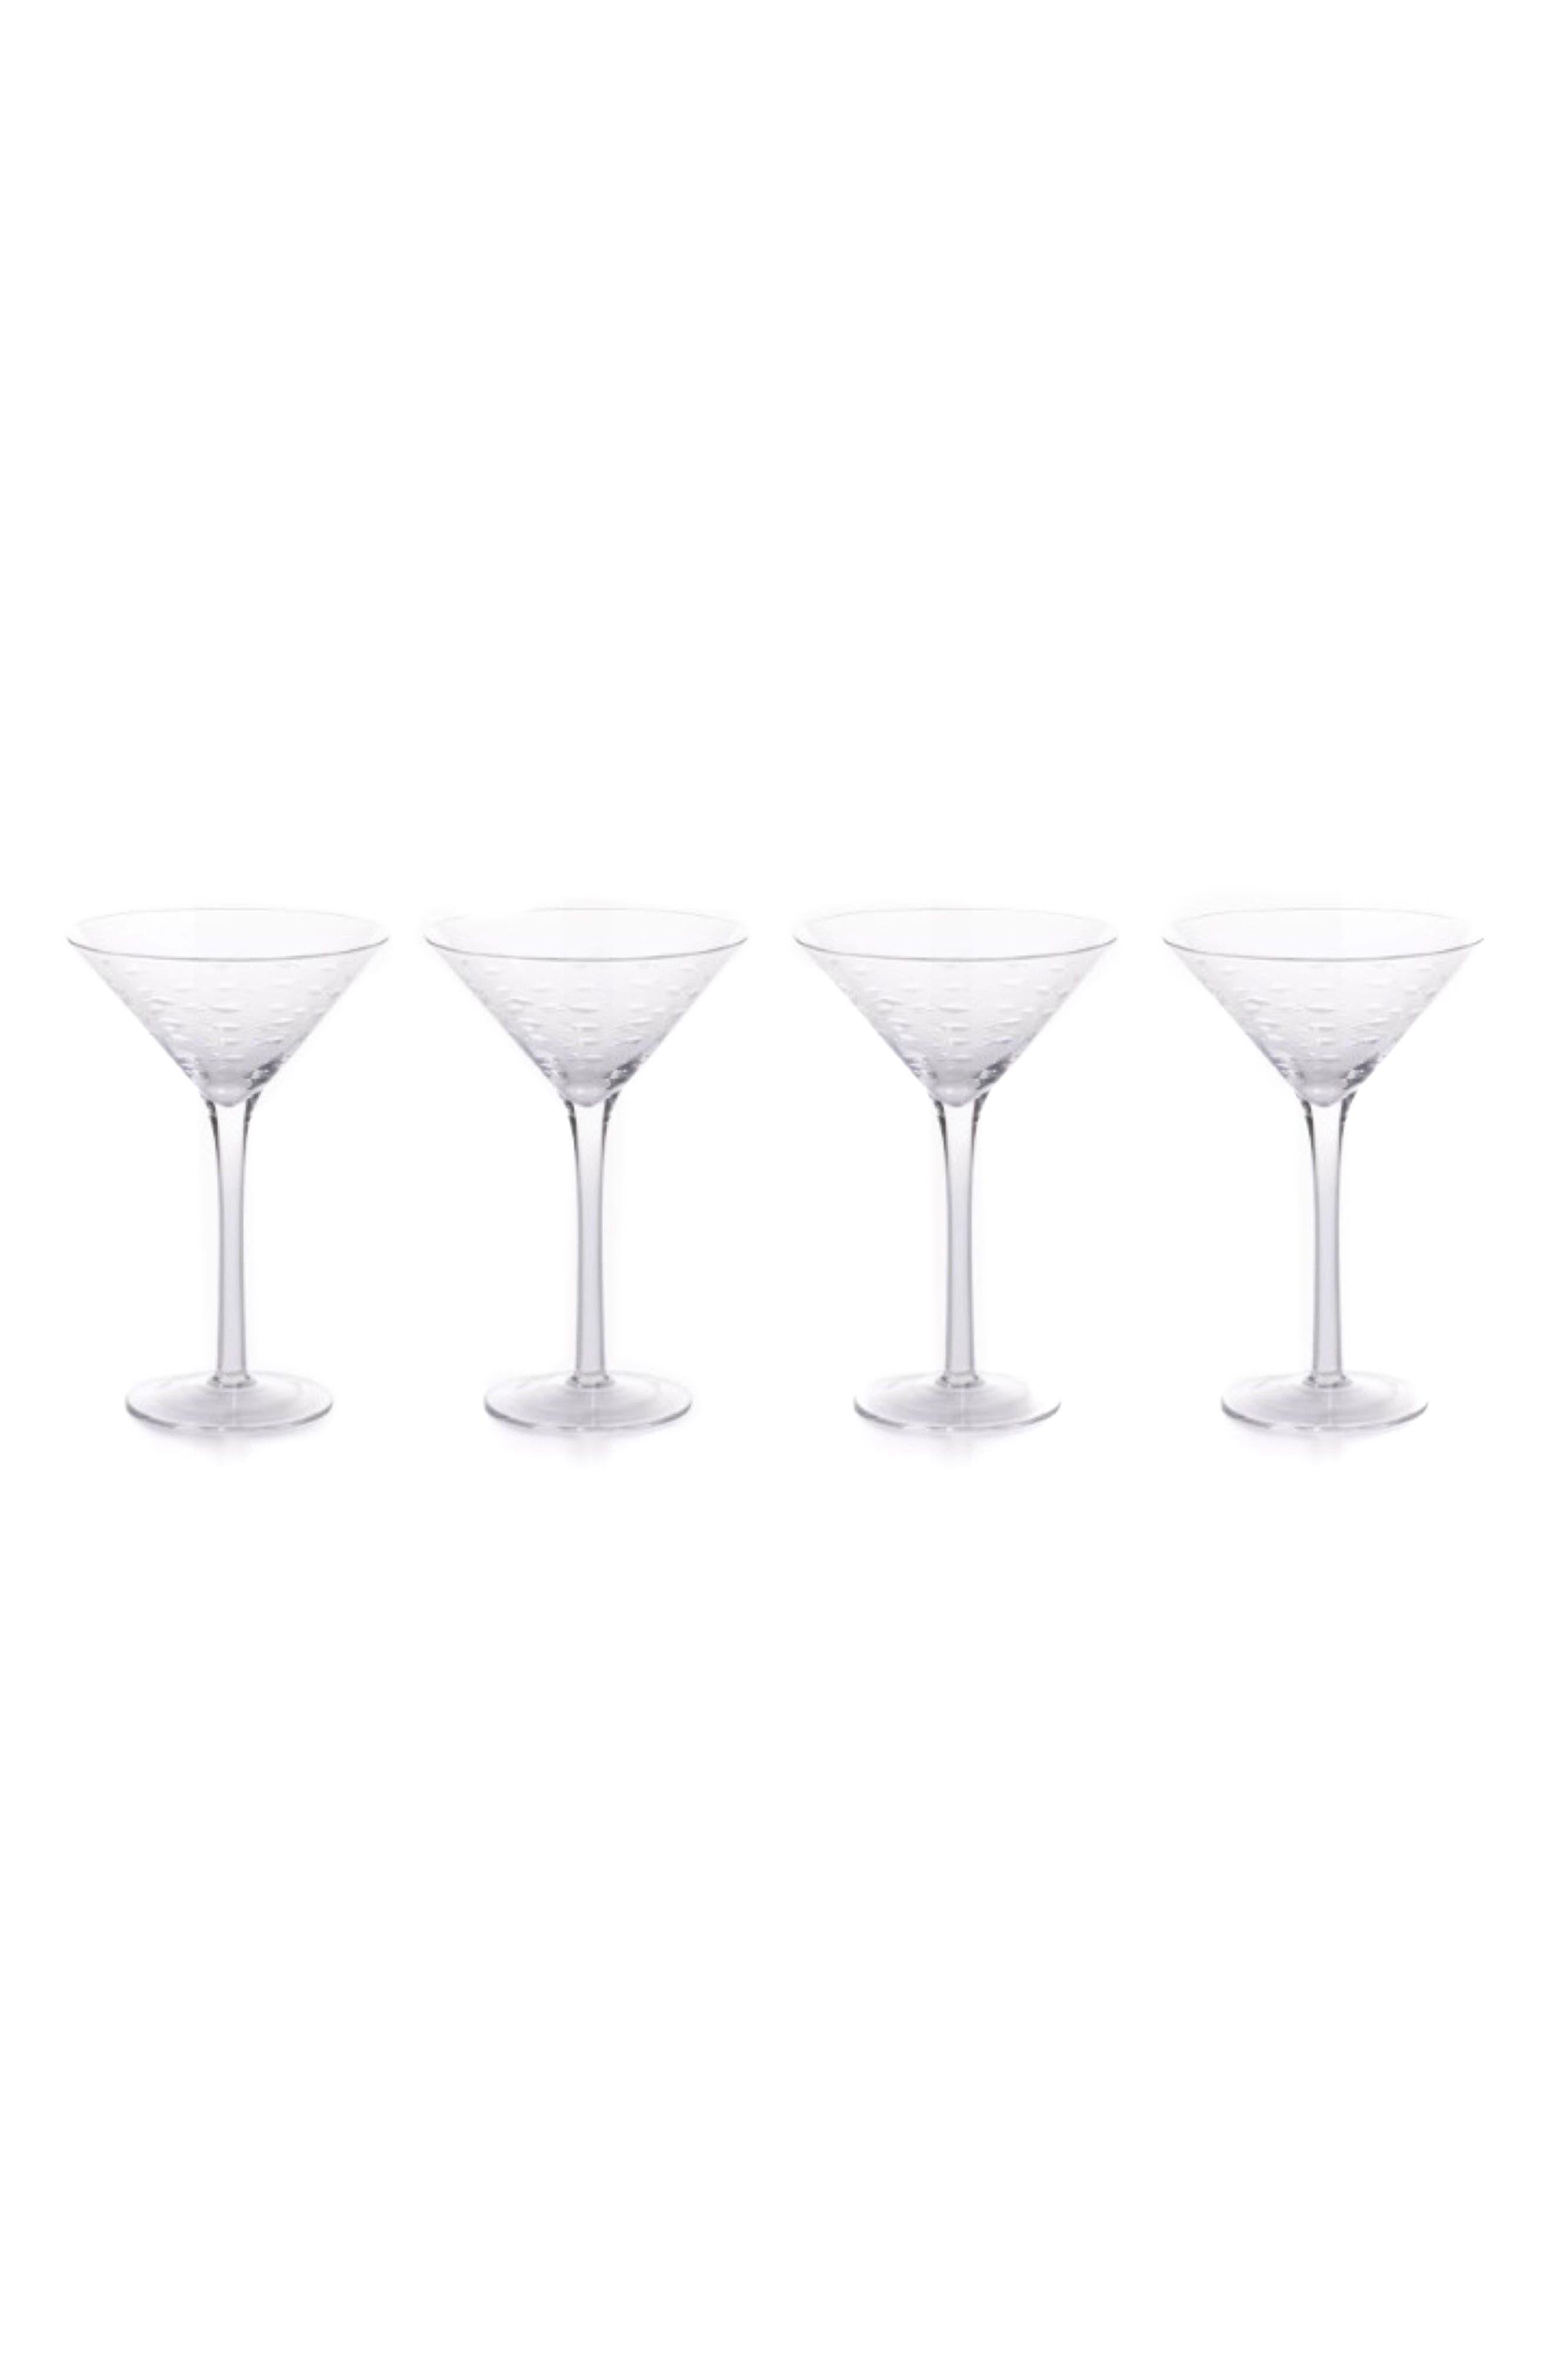 Keely Set of 4 Martini Glasses,                             Main thumbnail 1, color,                             100